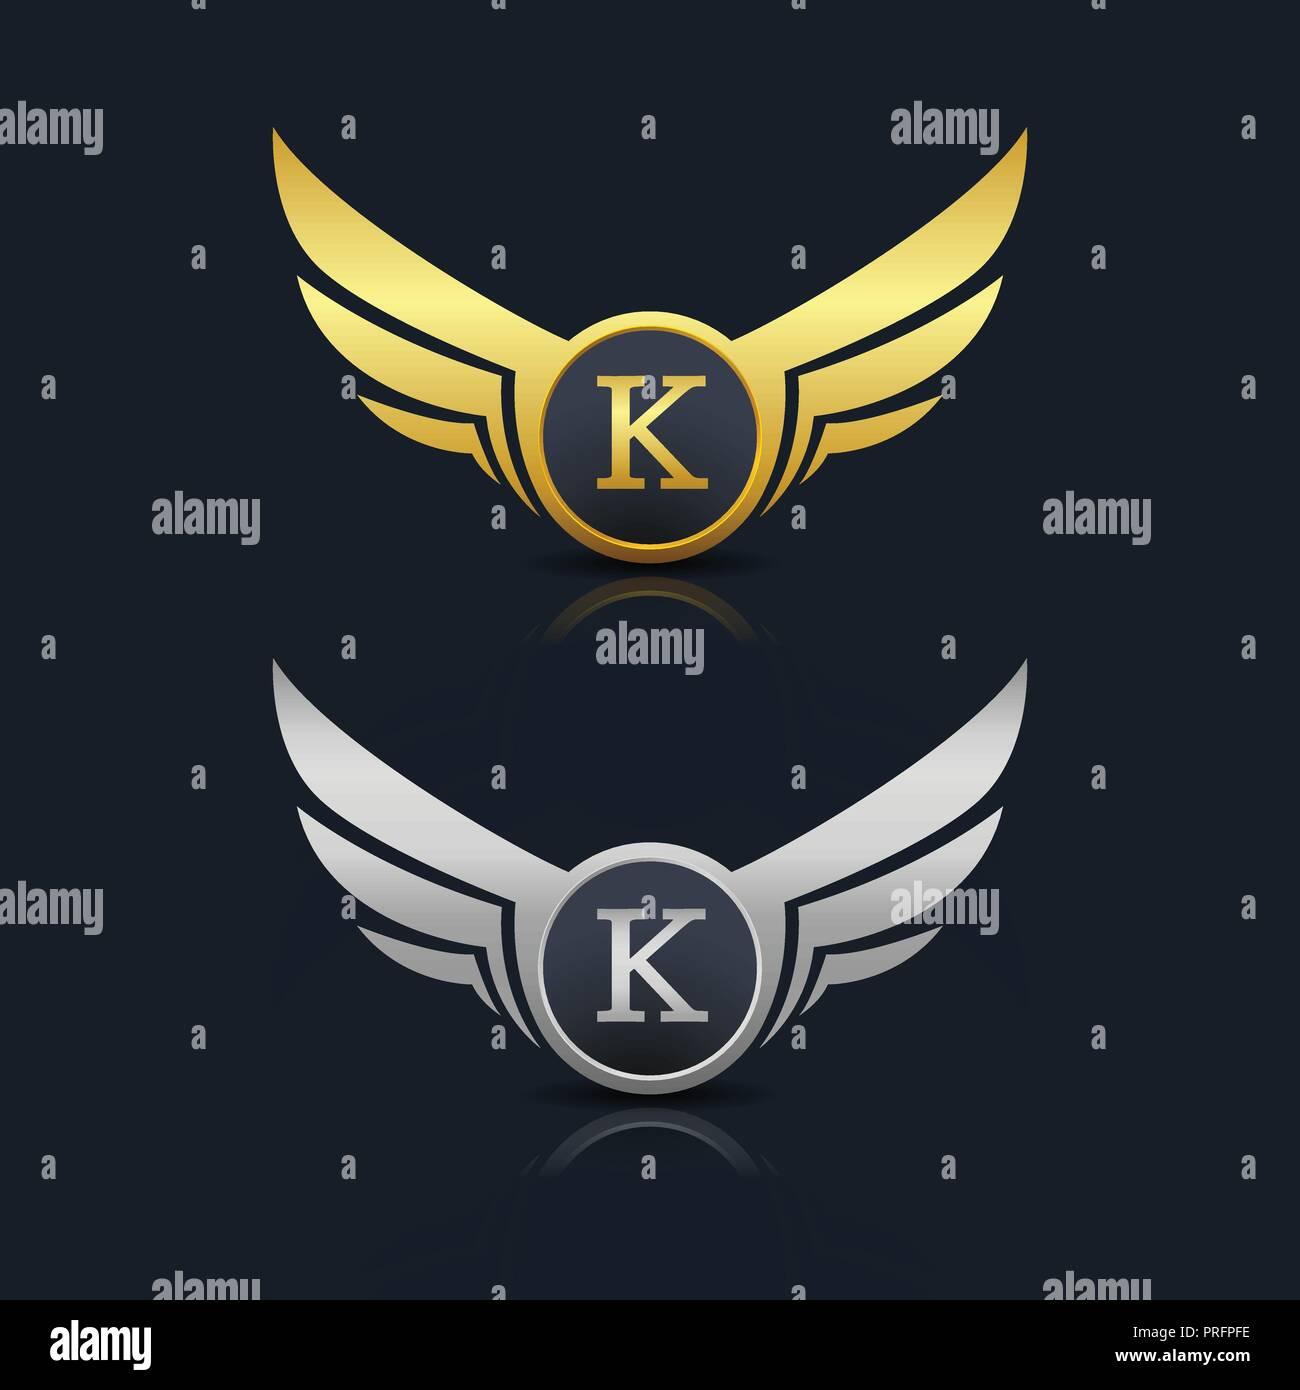 wings shield letter k logo template stock image